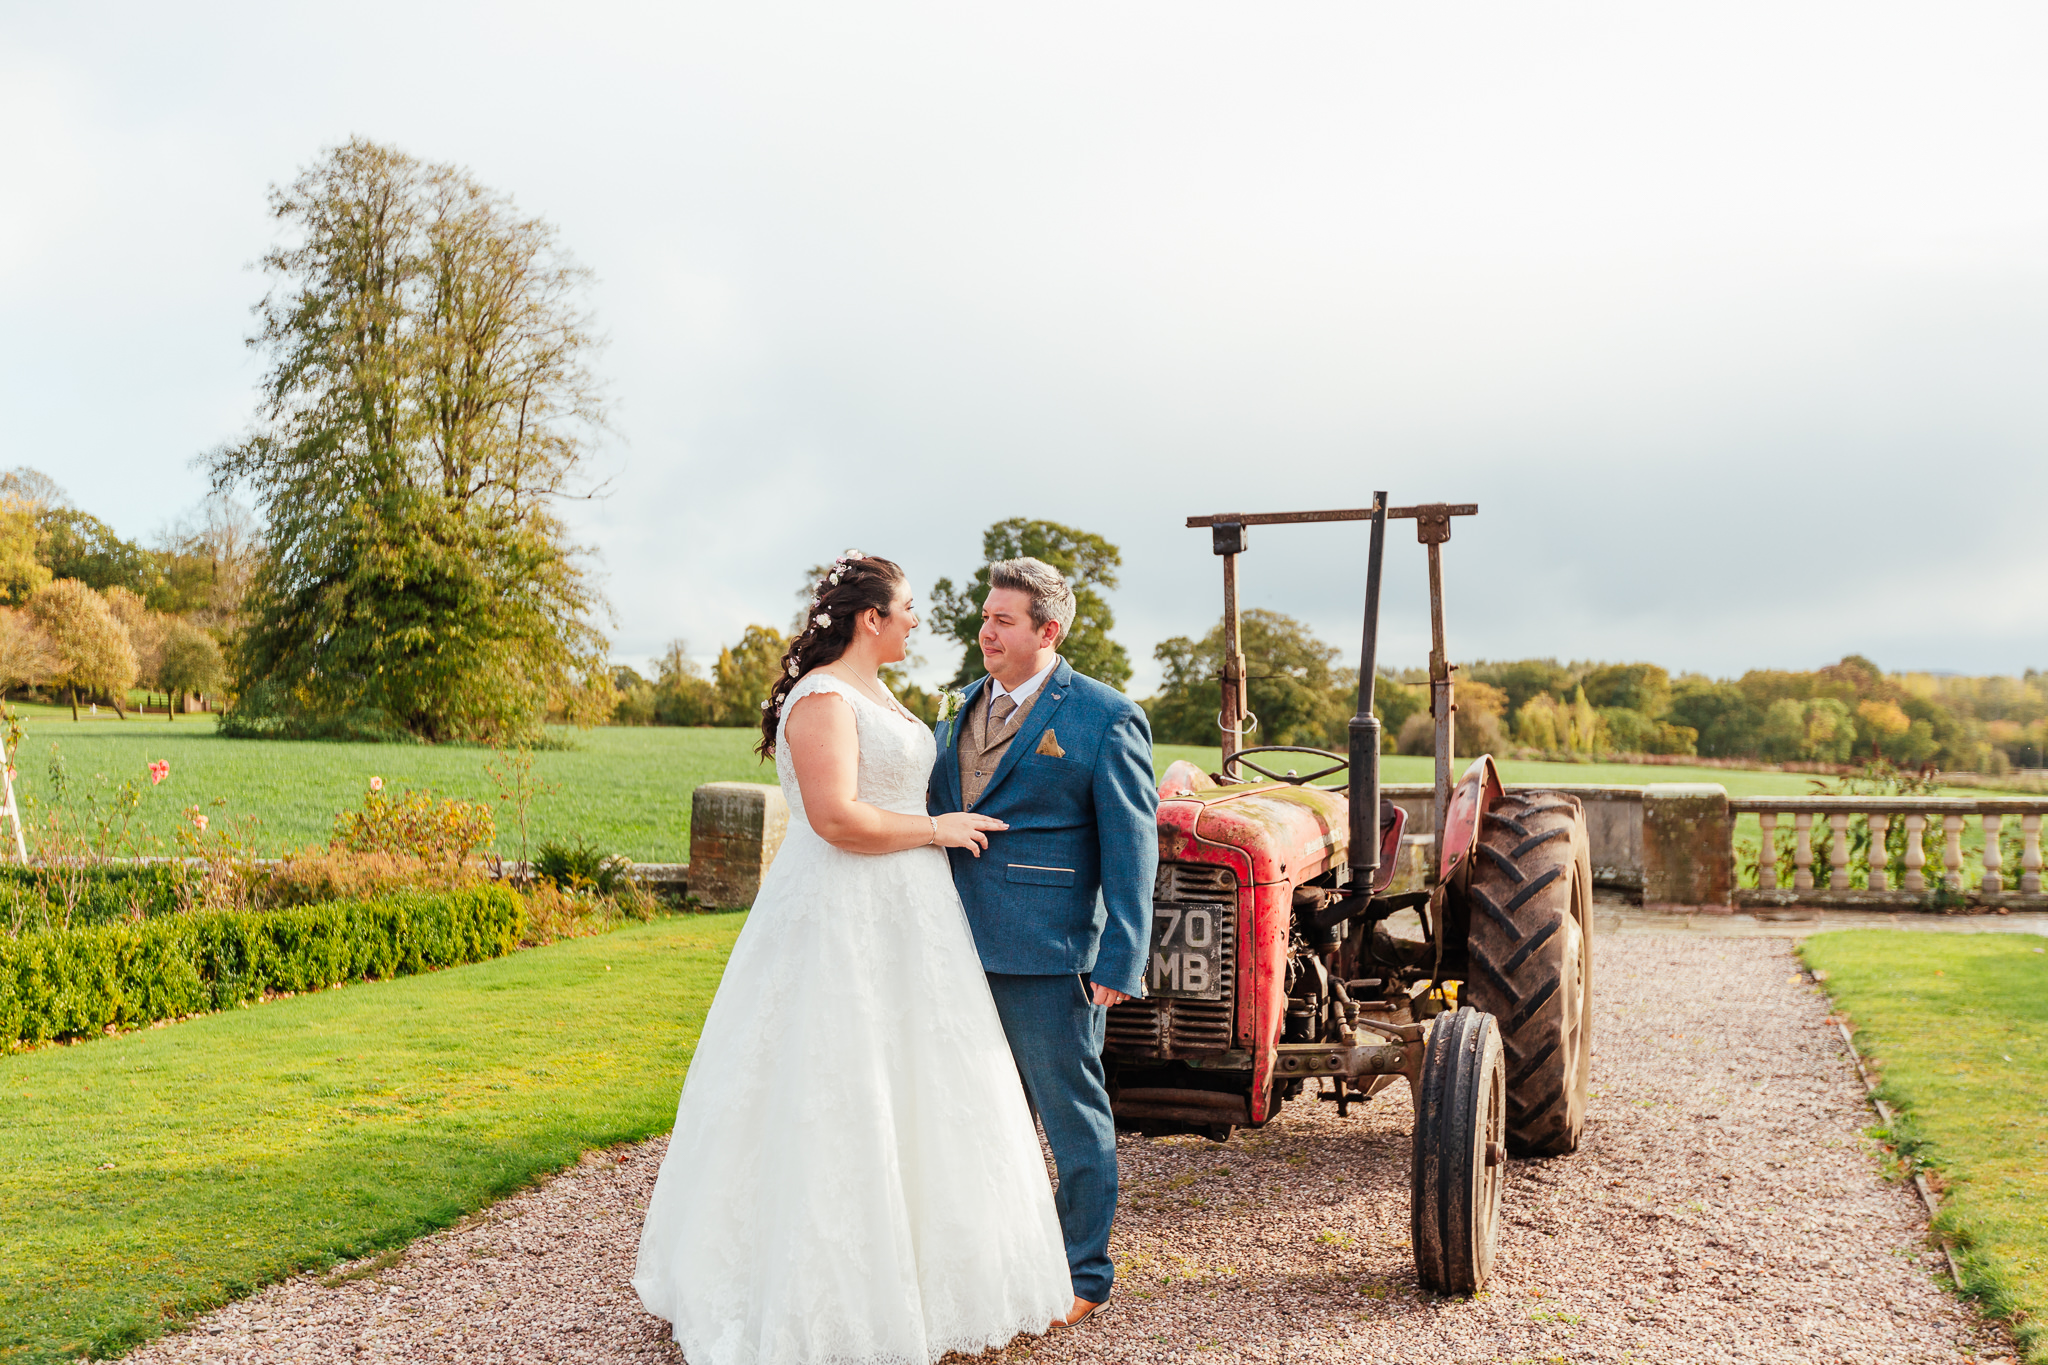 Willington-Hall-Cheshire-Wedding-29.jpg